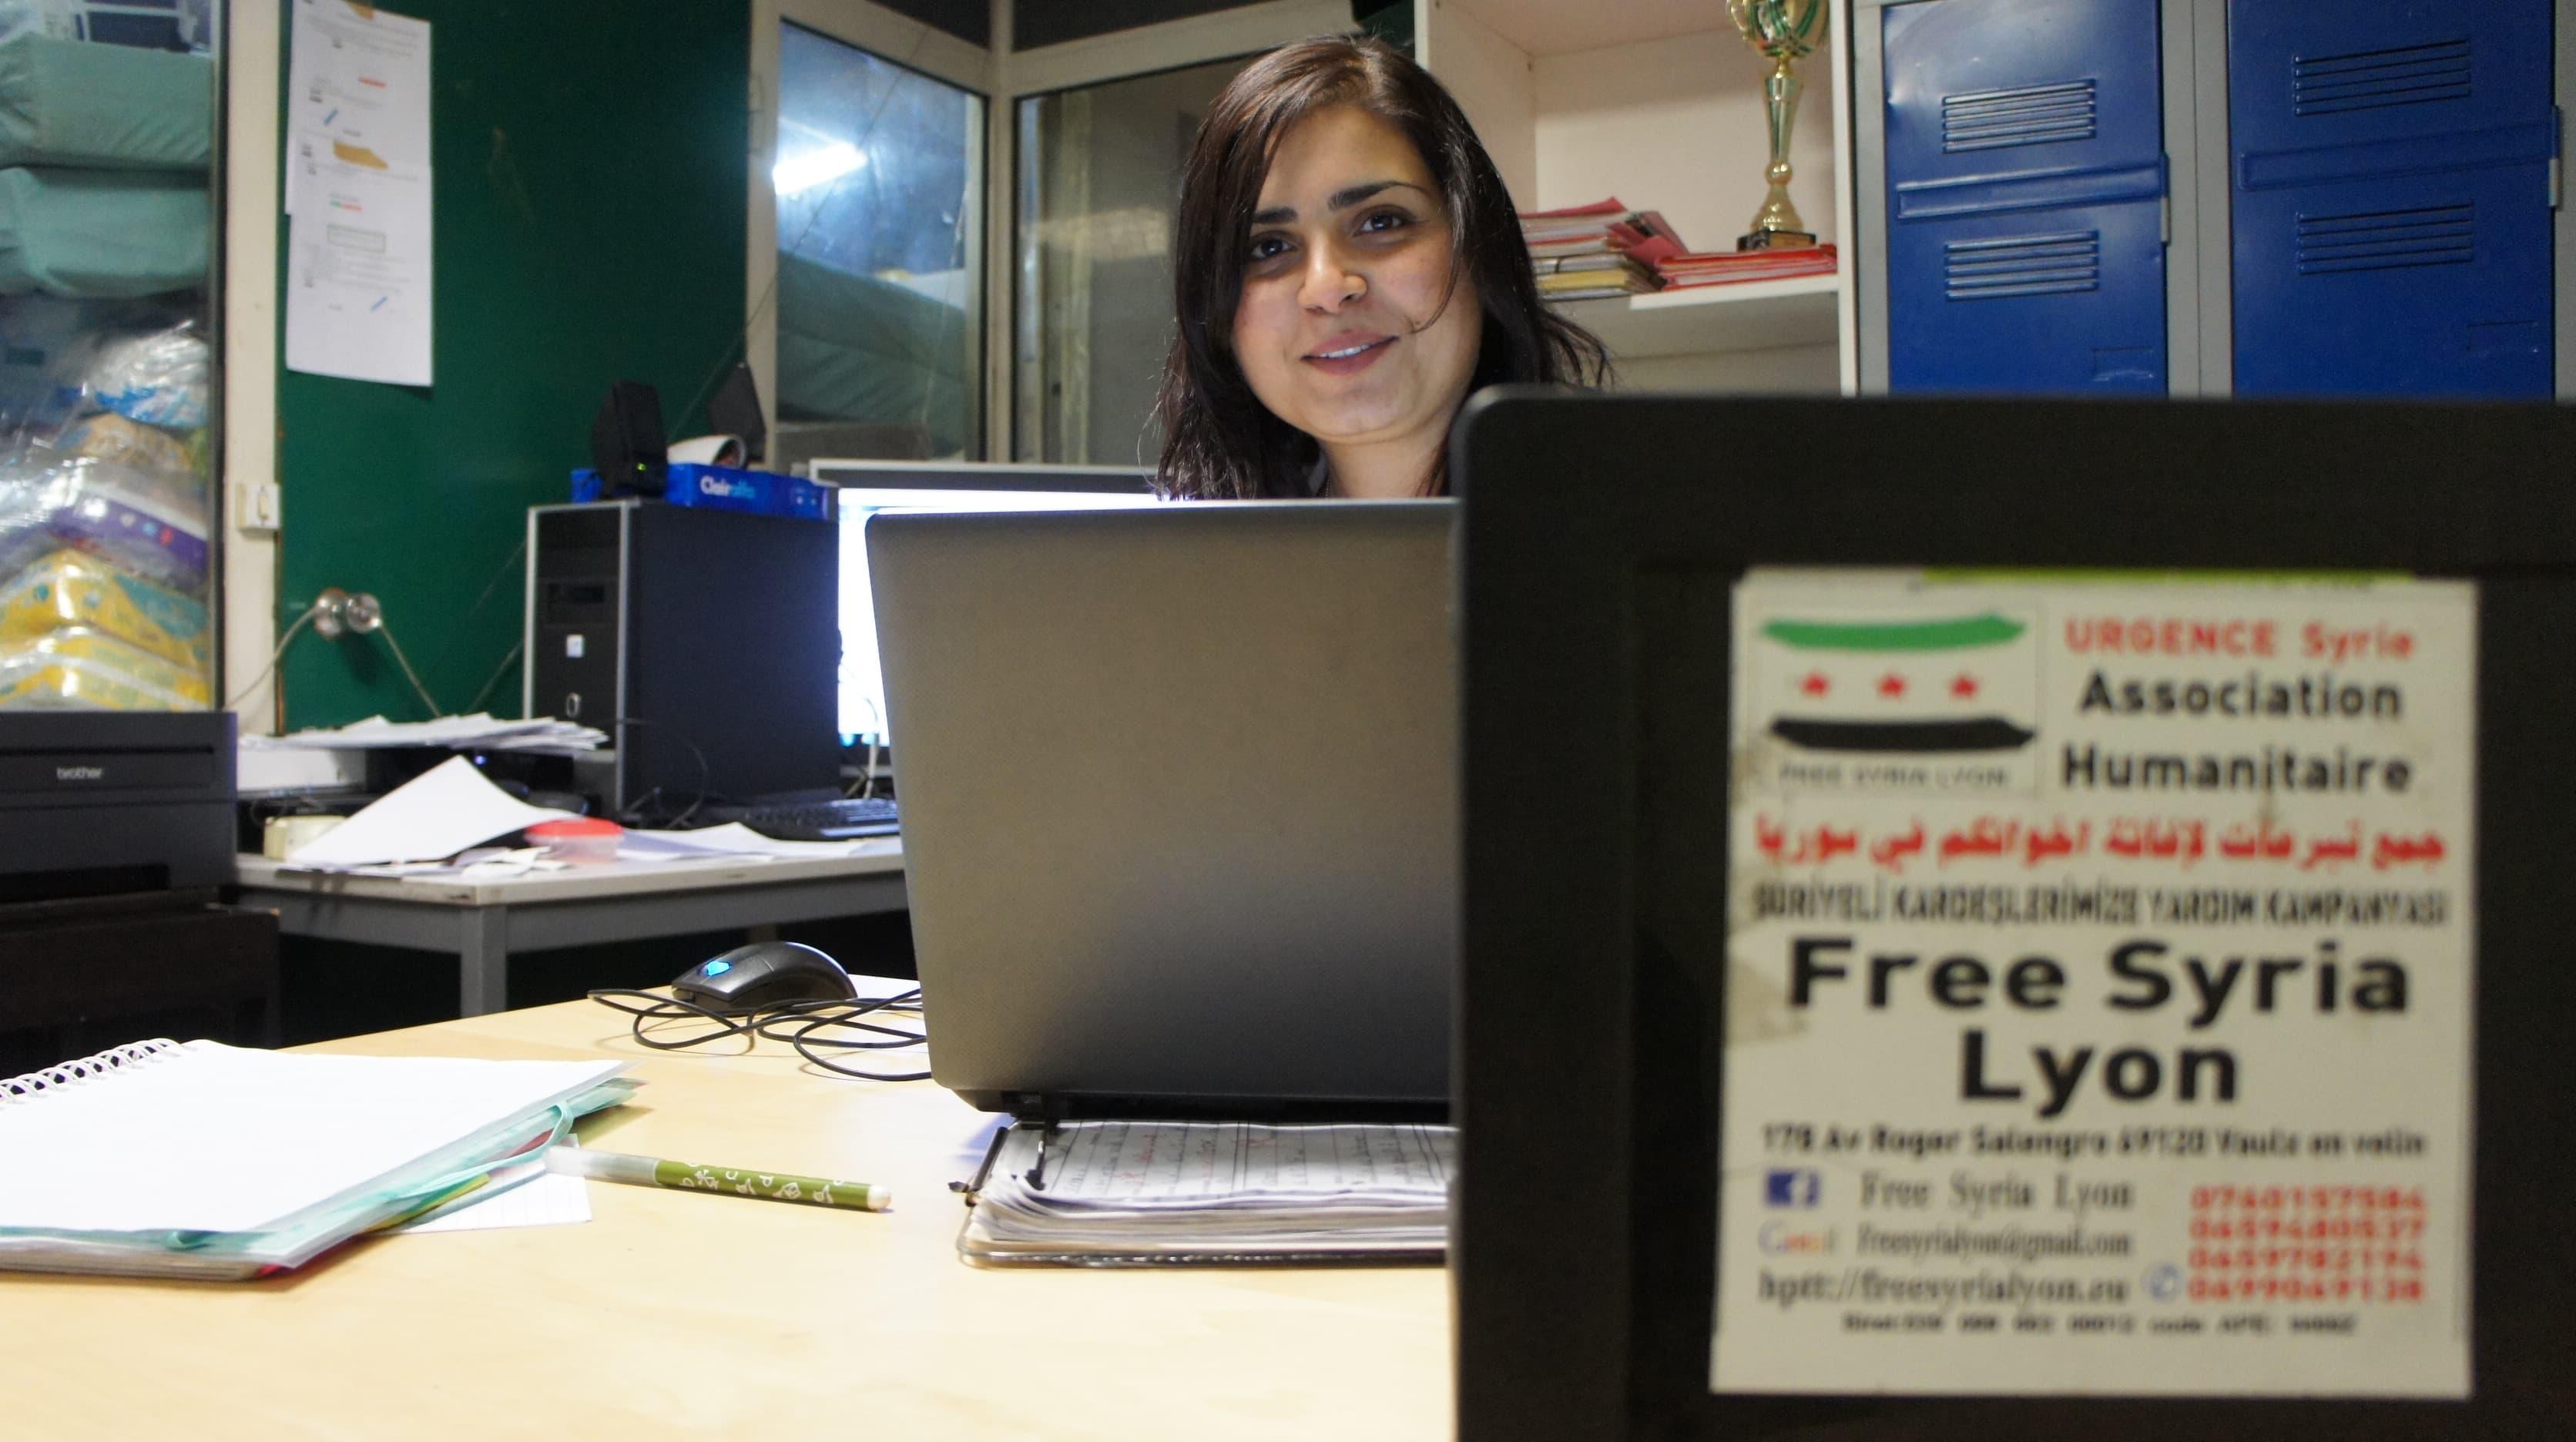 Farida Samaoui gère bénévolement l'aspect administratif de Free Syria Lyon. ©Rue89Lyon